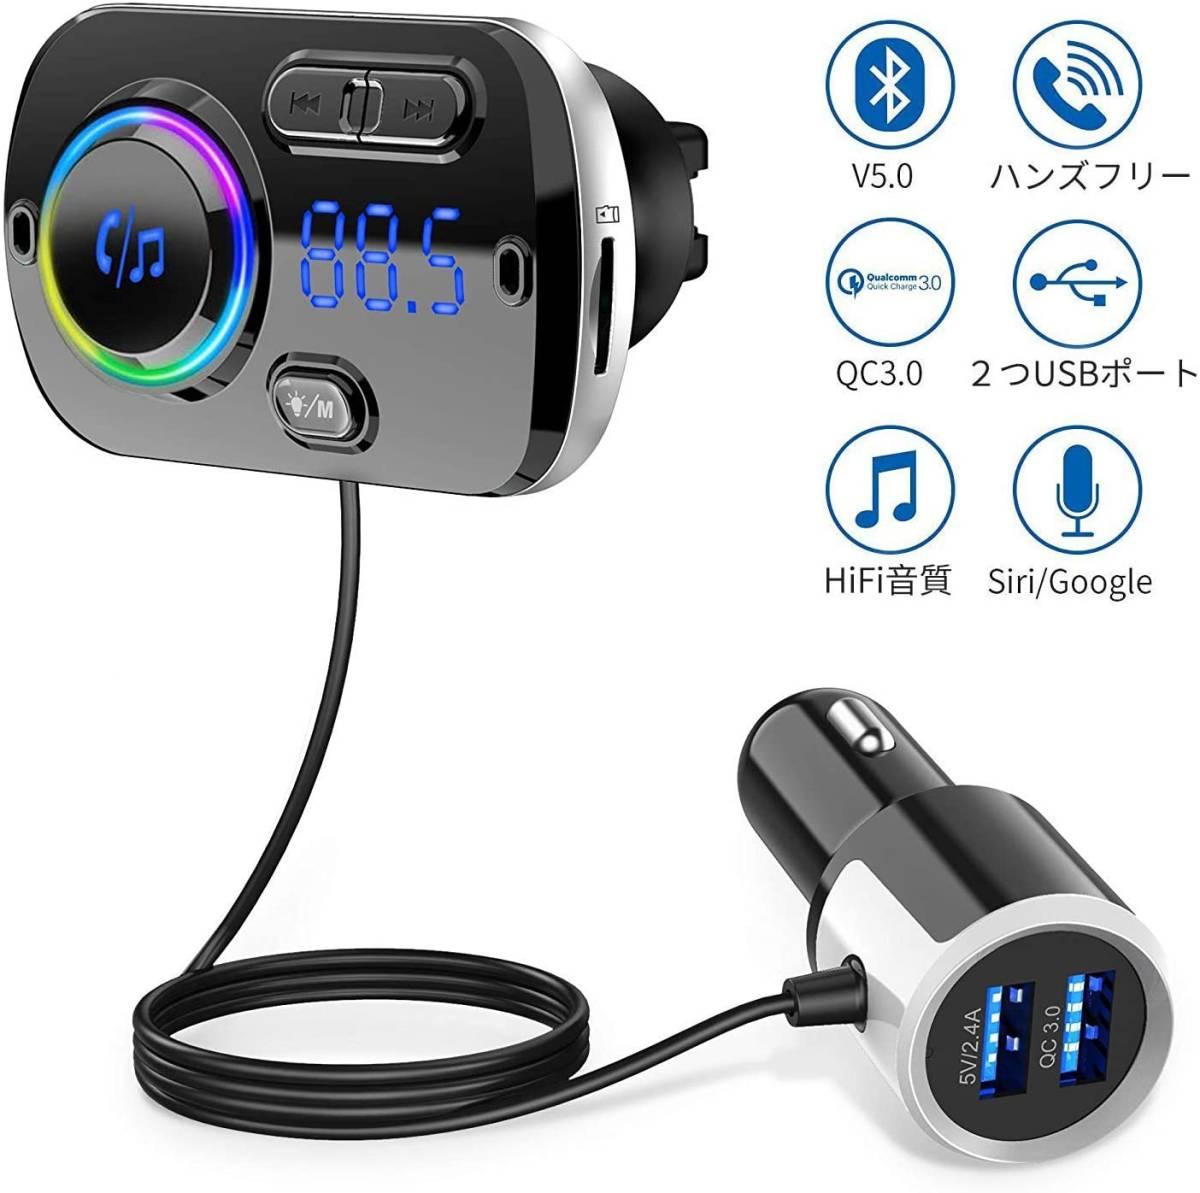 】FMトランスミッター. Bluetooth 5.0+EDR (5V/2.4A&3Aハンズフリー通話 Google assistant&Siri対応 波数仕様 87.5~108.0Mhz ORITO_画像1